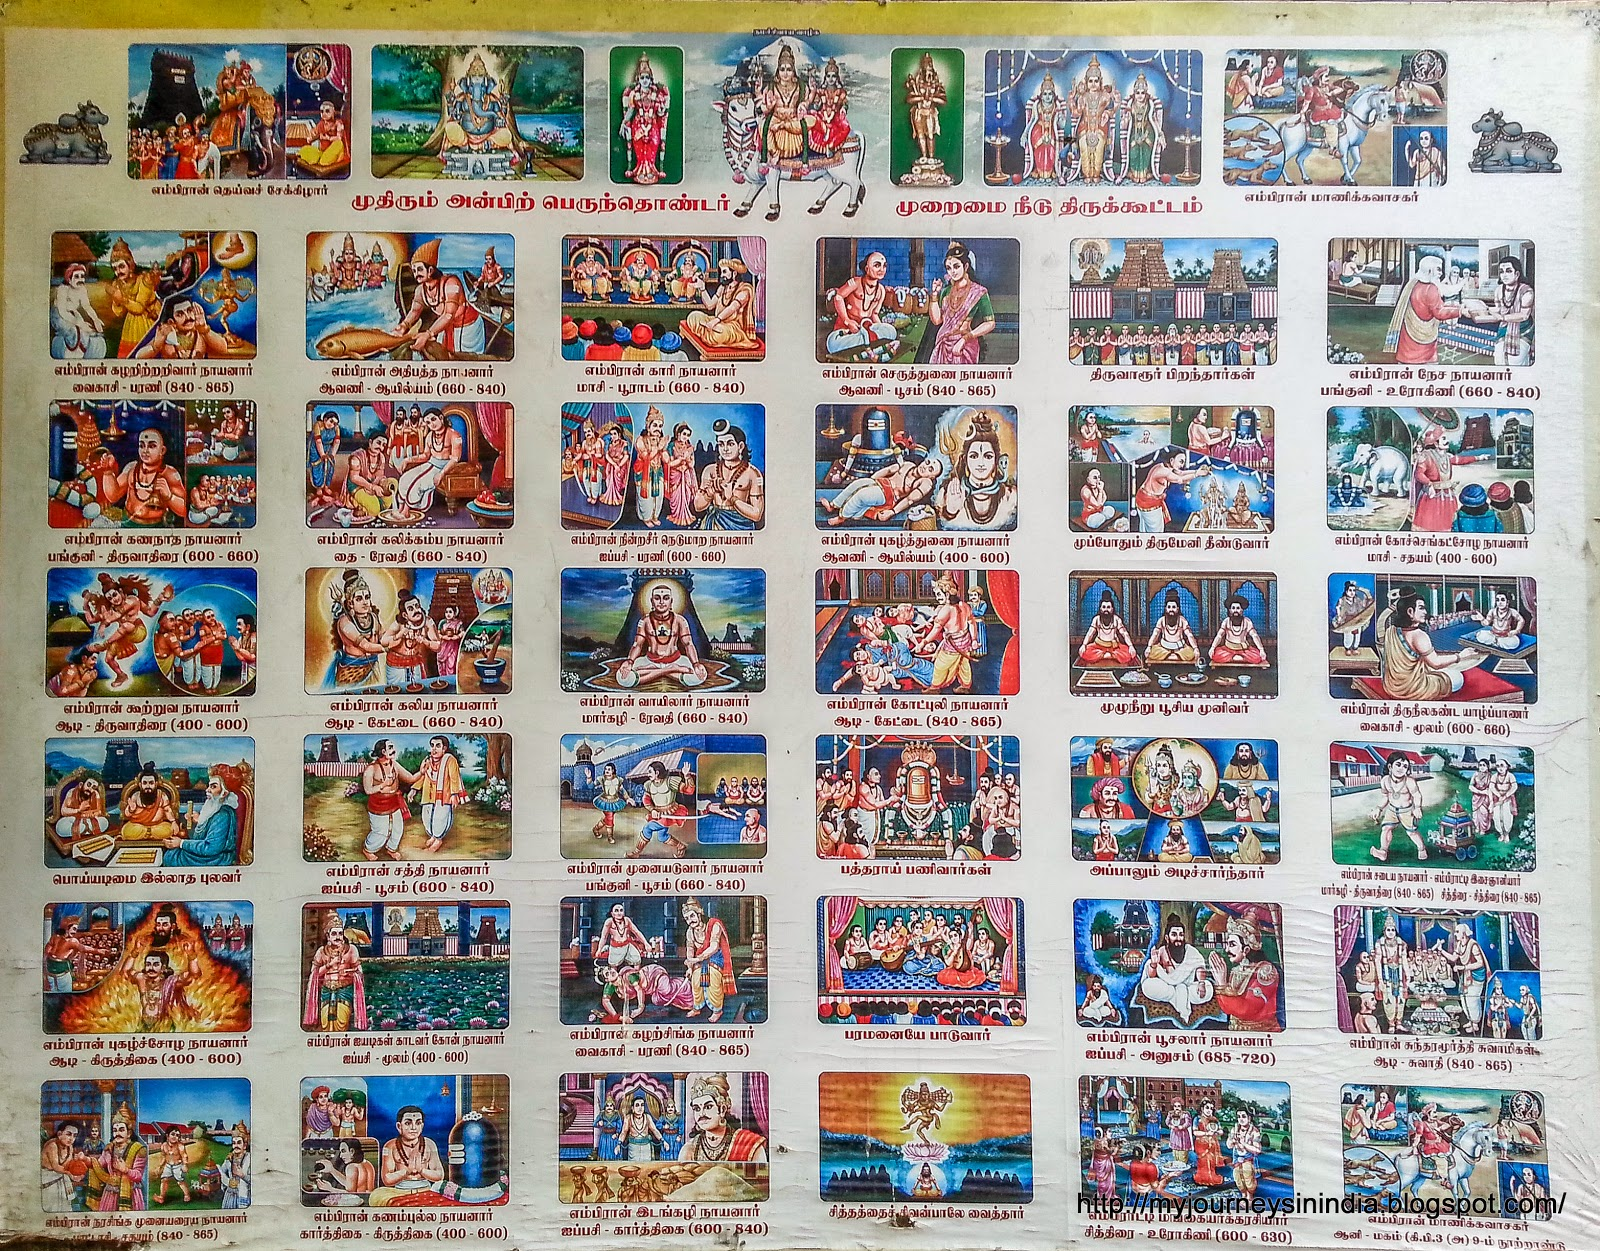 Tiruvaiyaru Aiyarappar Temple Nayanmar Info Board